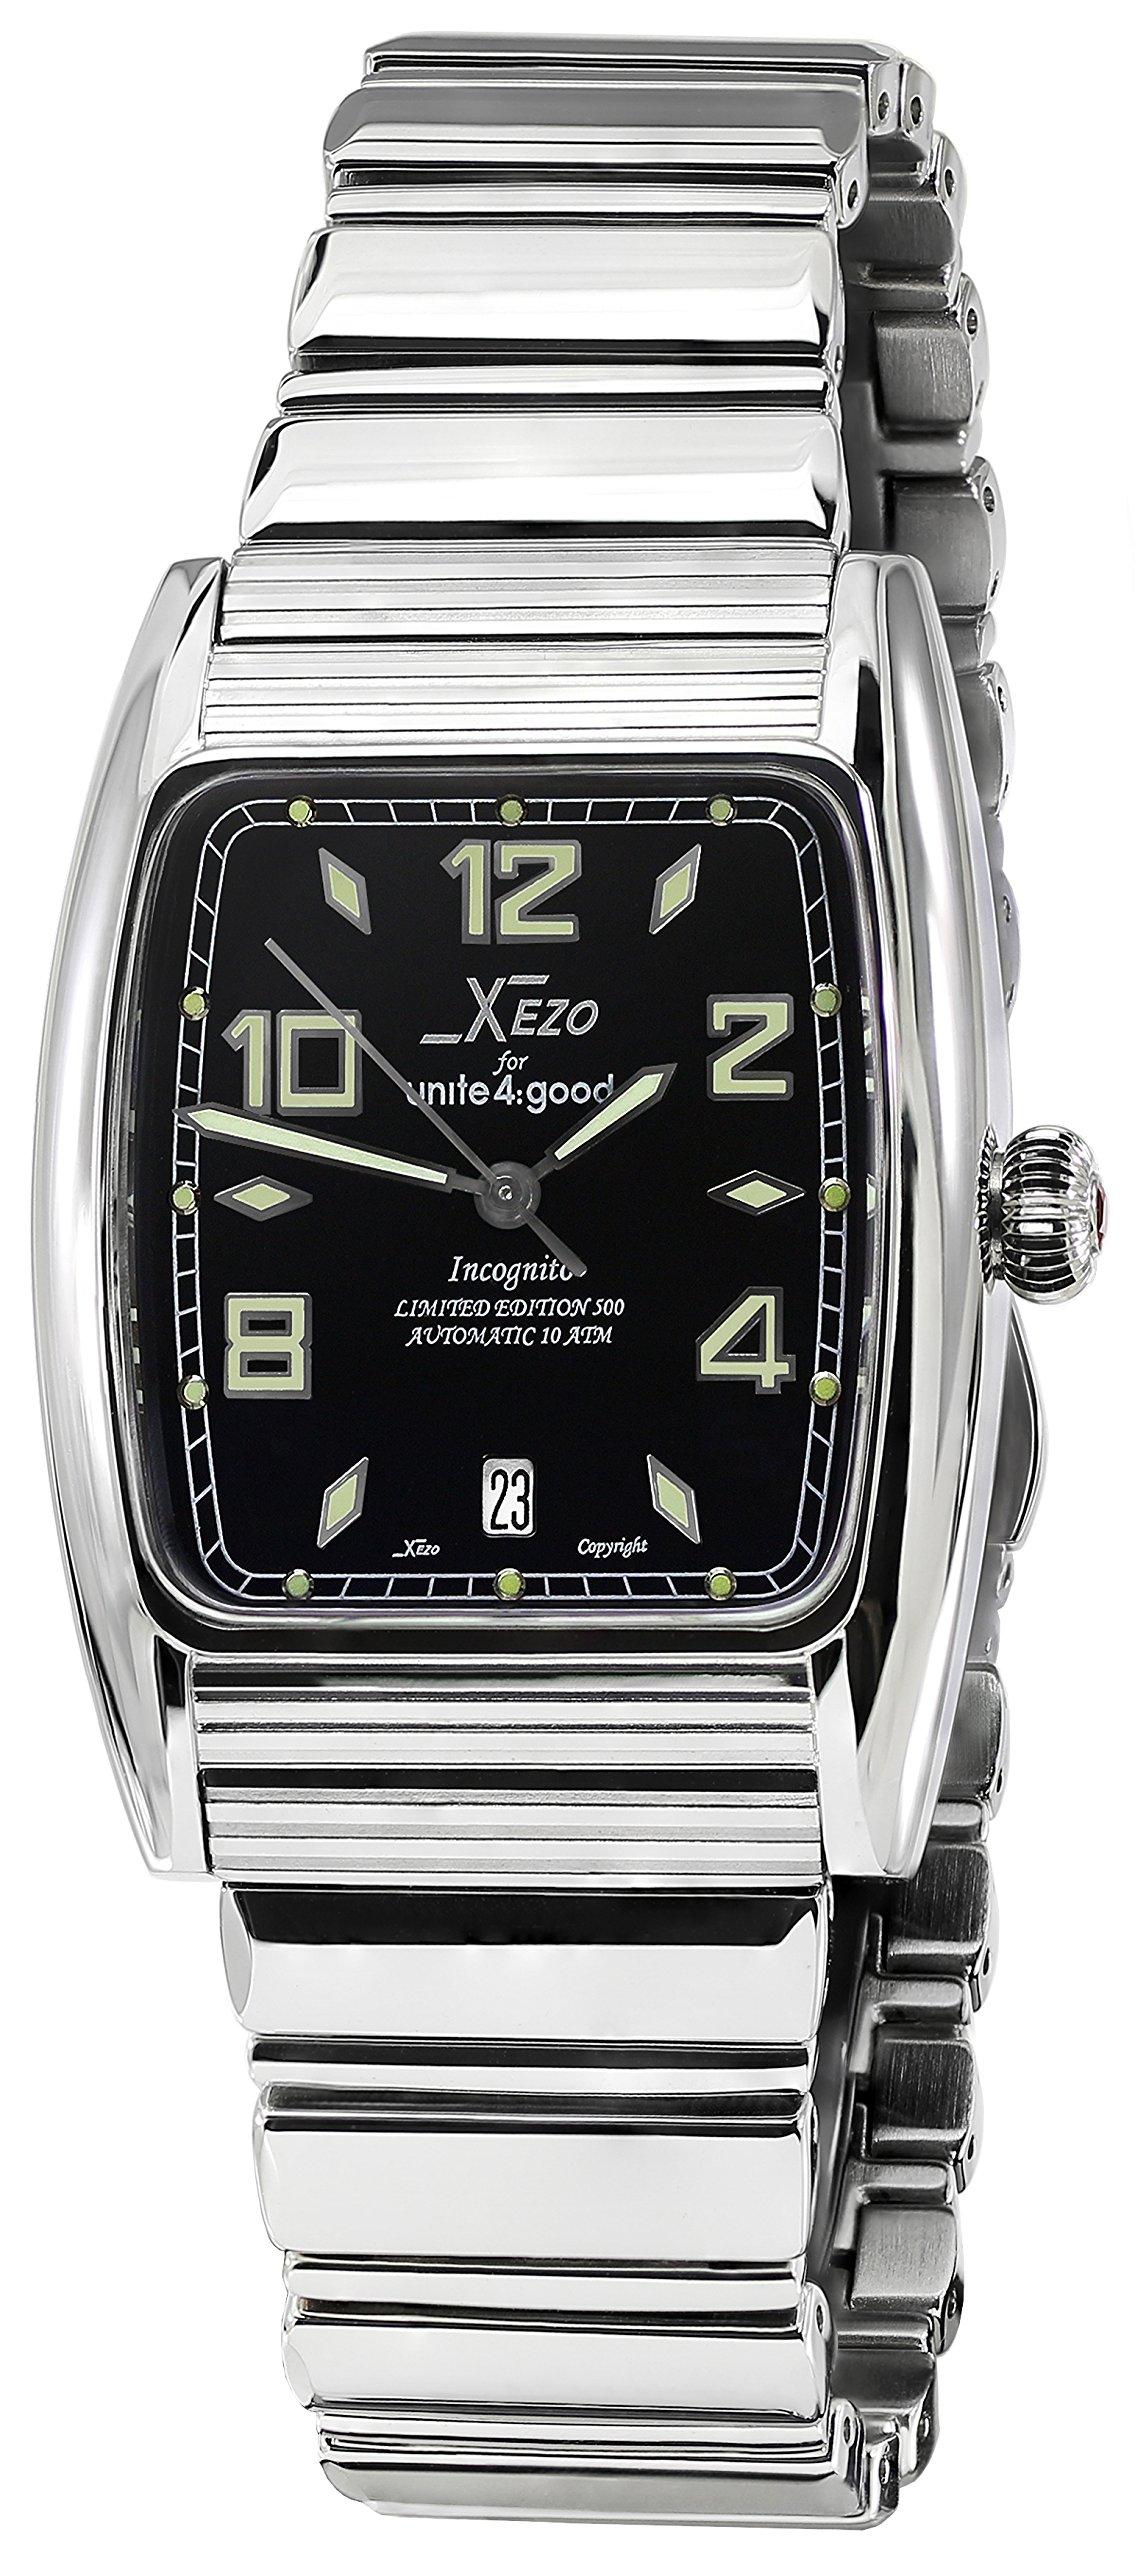 Xezo Incognito Men's 10 ATM Water Resistant Tonneau Watch, Silver